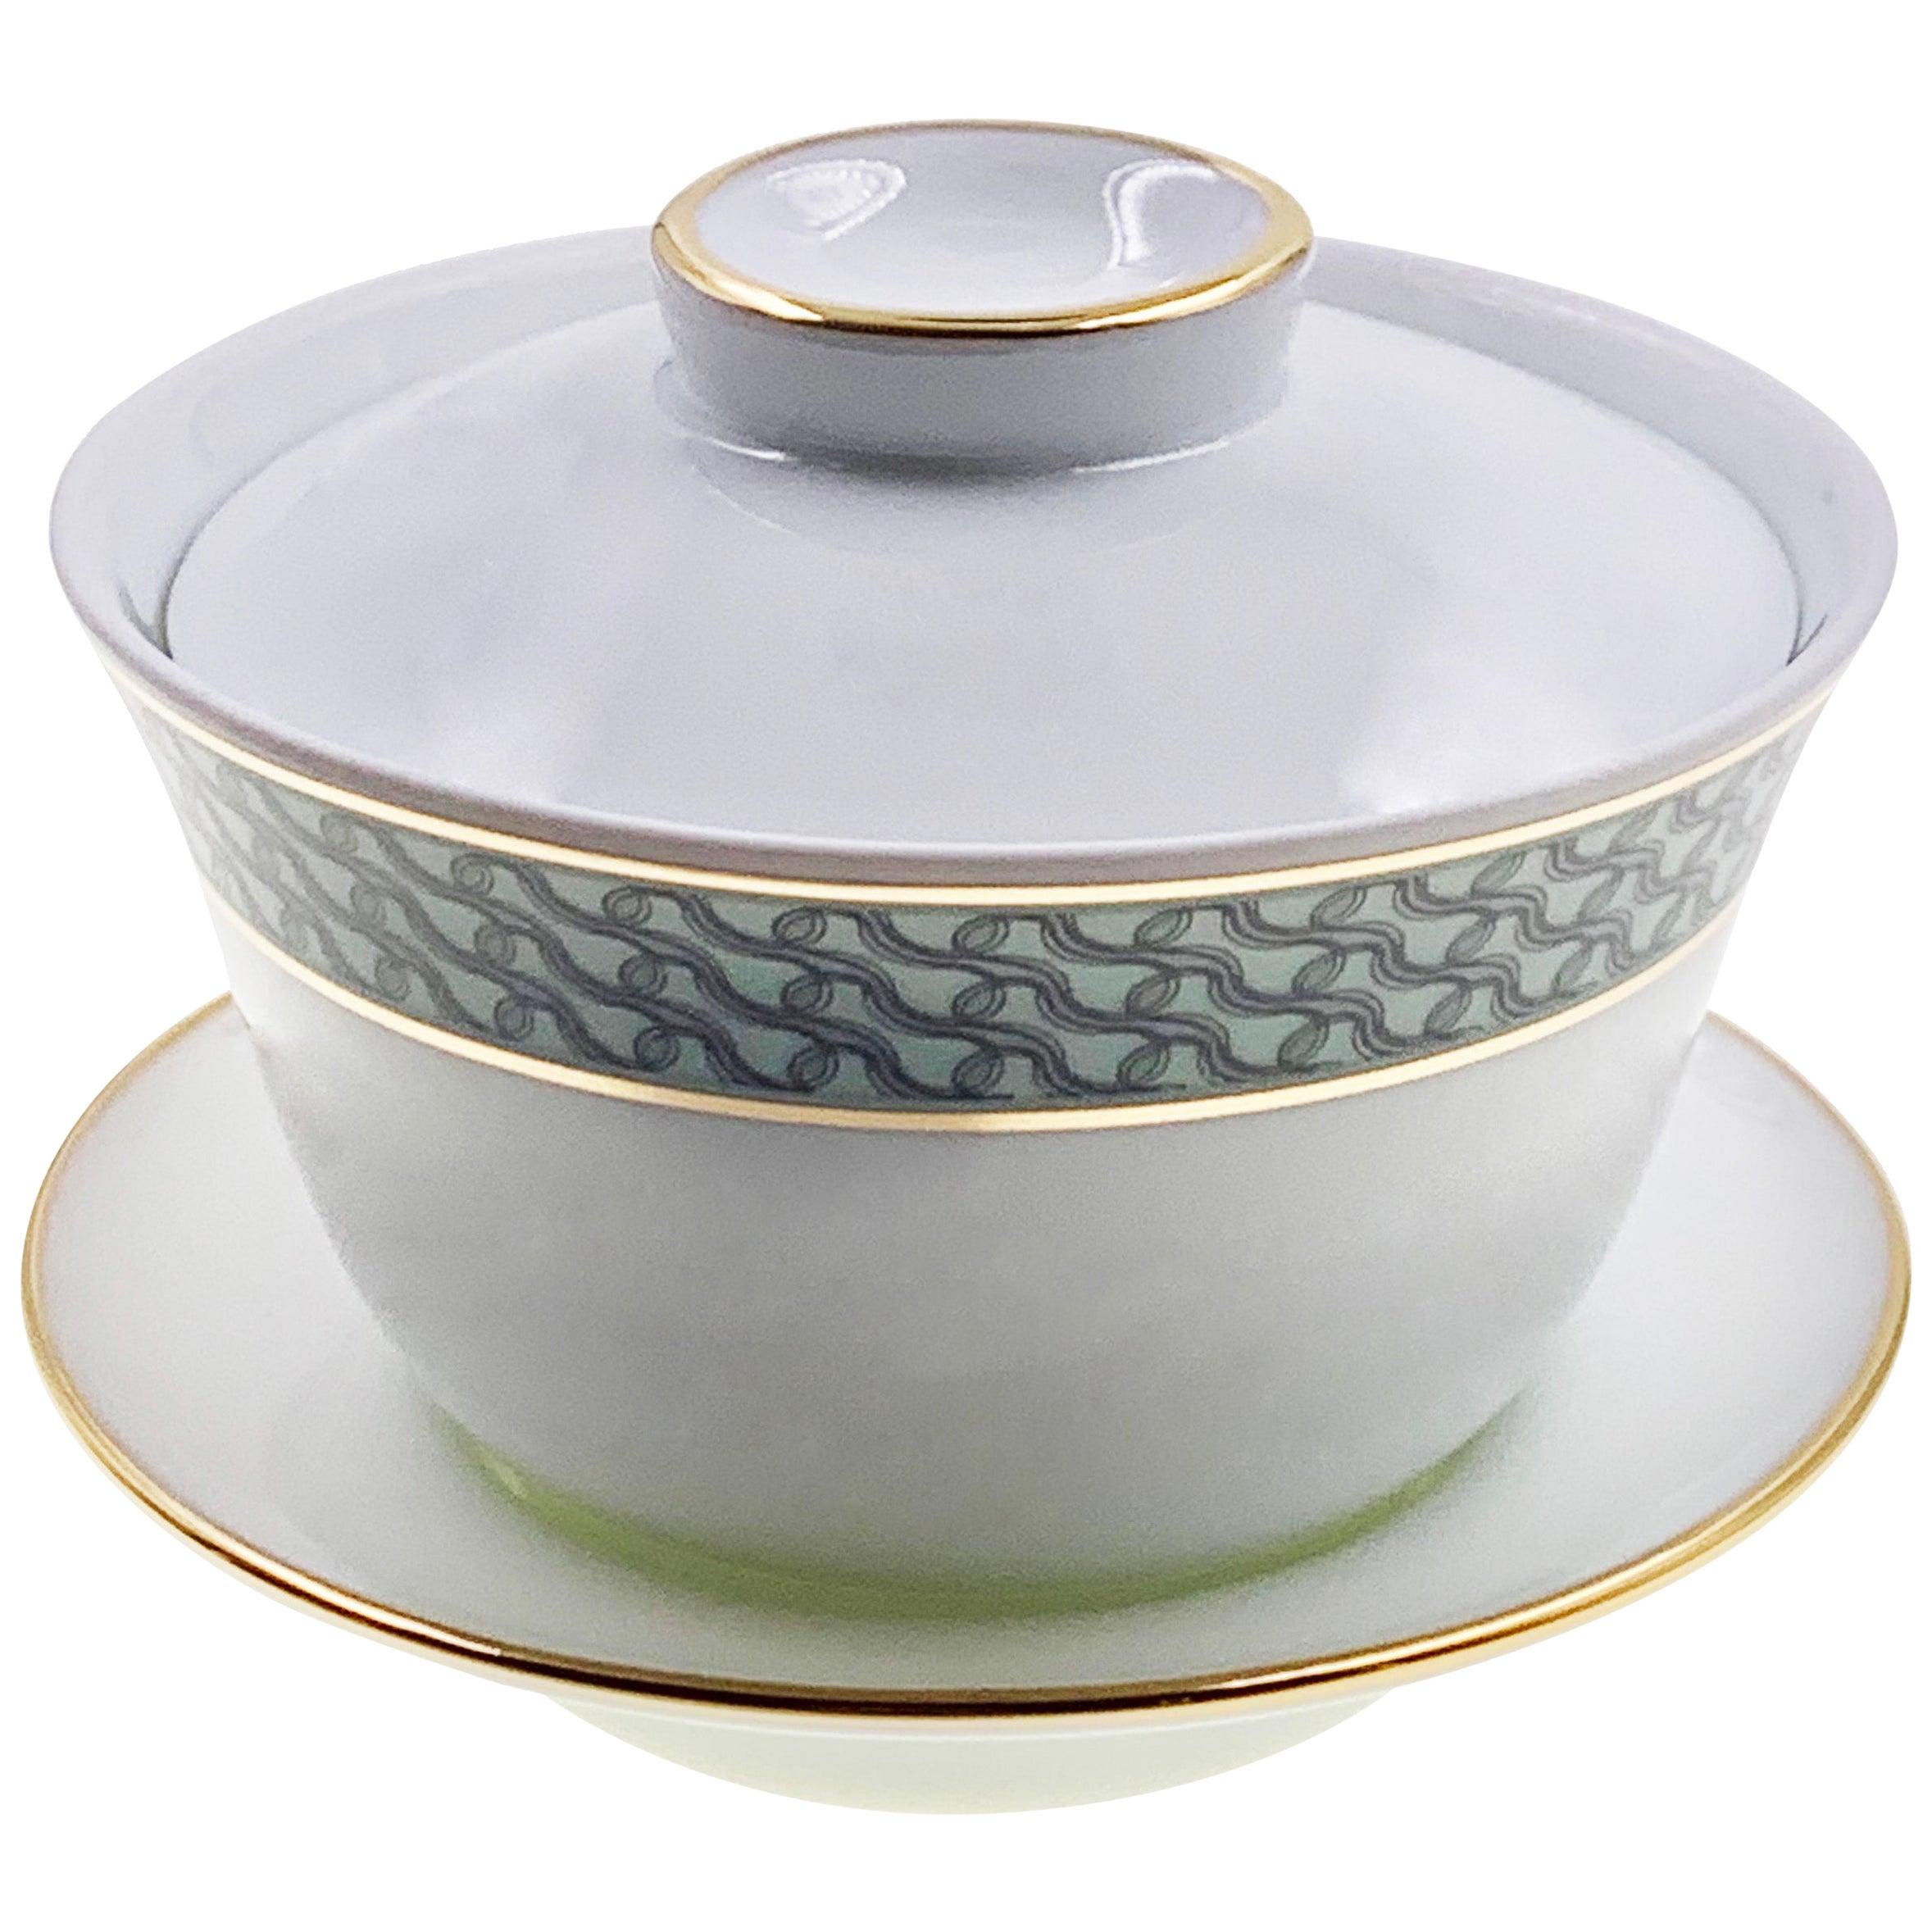 Set Of 2 Chinese Tea Cup Gaiwan Set Mid Century Rhythm André Fu Living Tableware